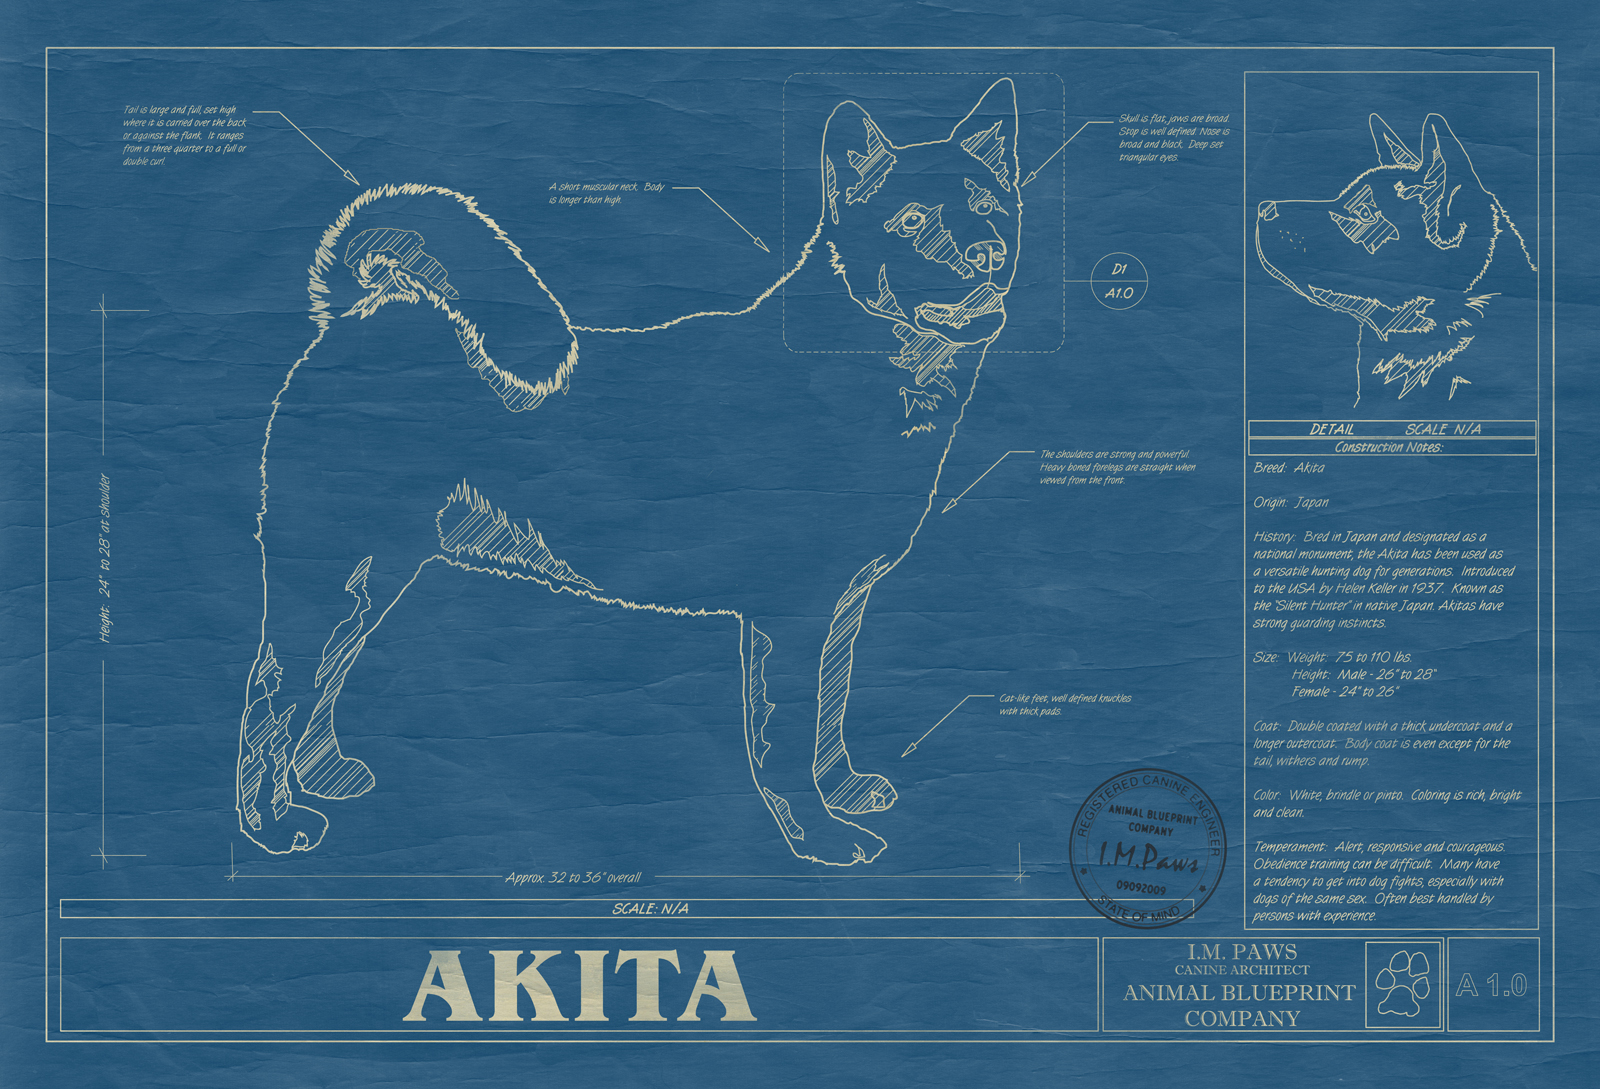 Akita animal blueprint company click image to enlarge malvernweather Images